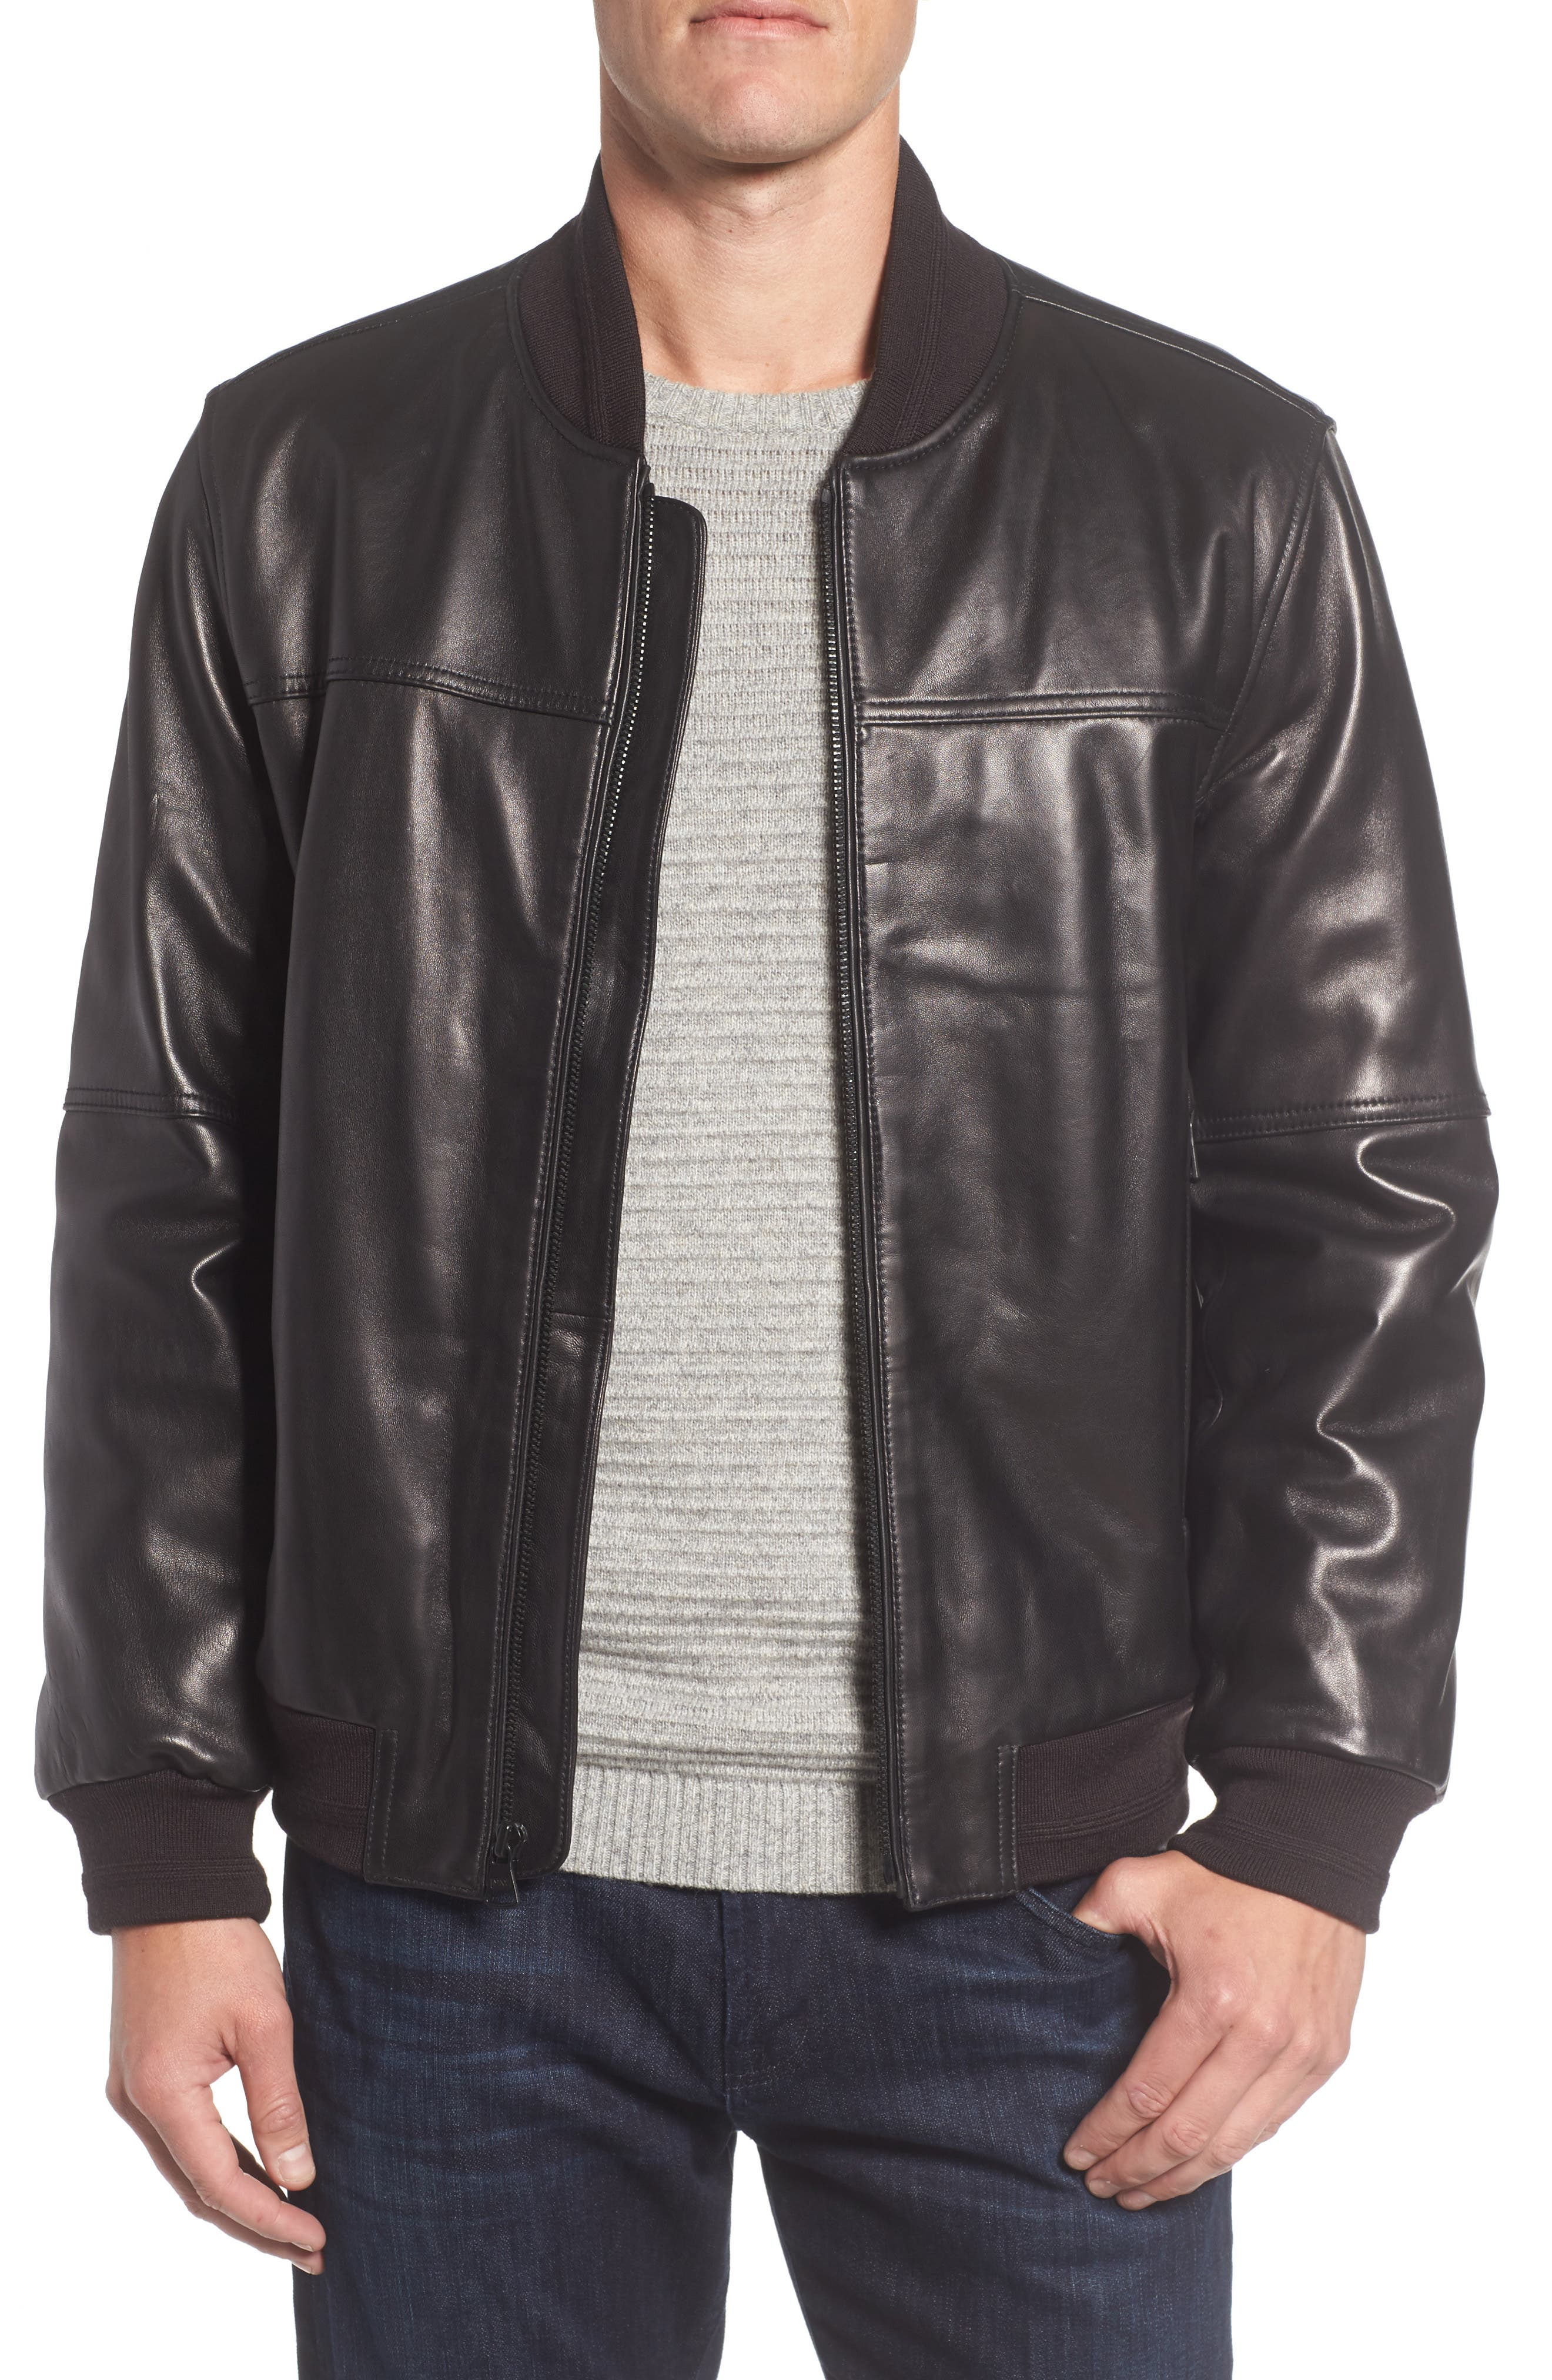 Summit Leather Bomber Jacket,                             Main thumbnail 1, color,                             001